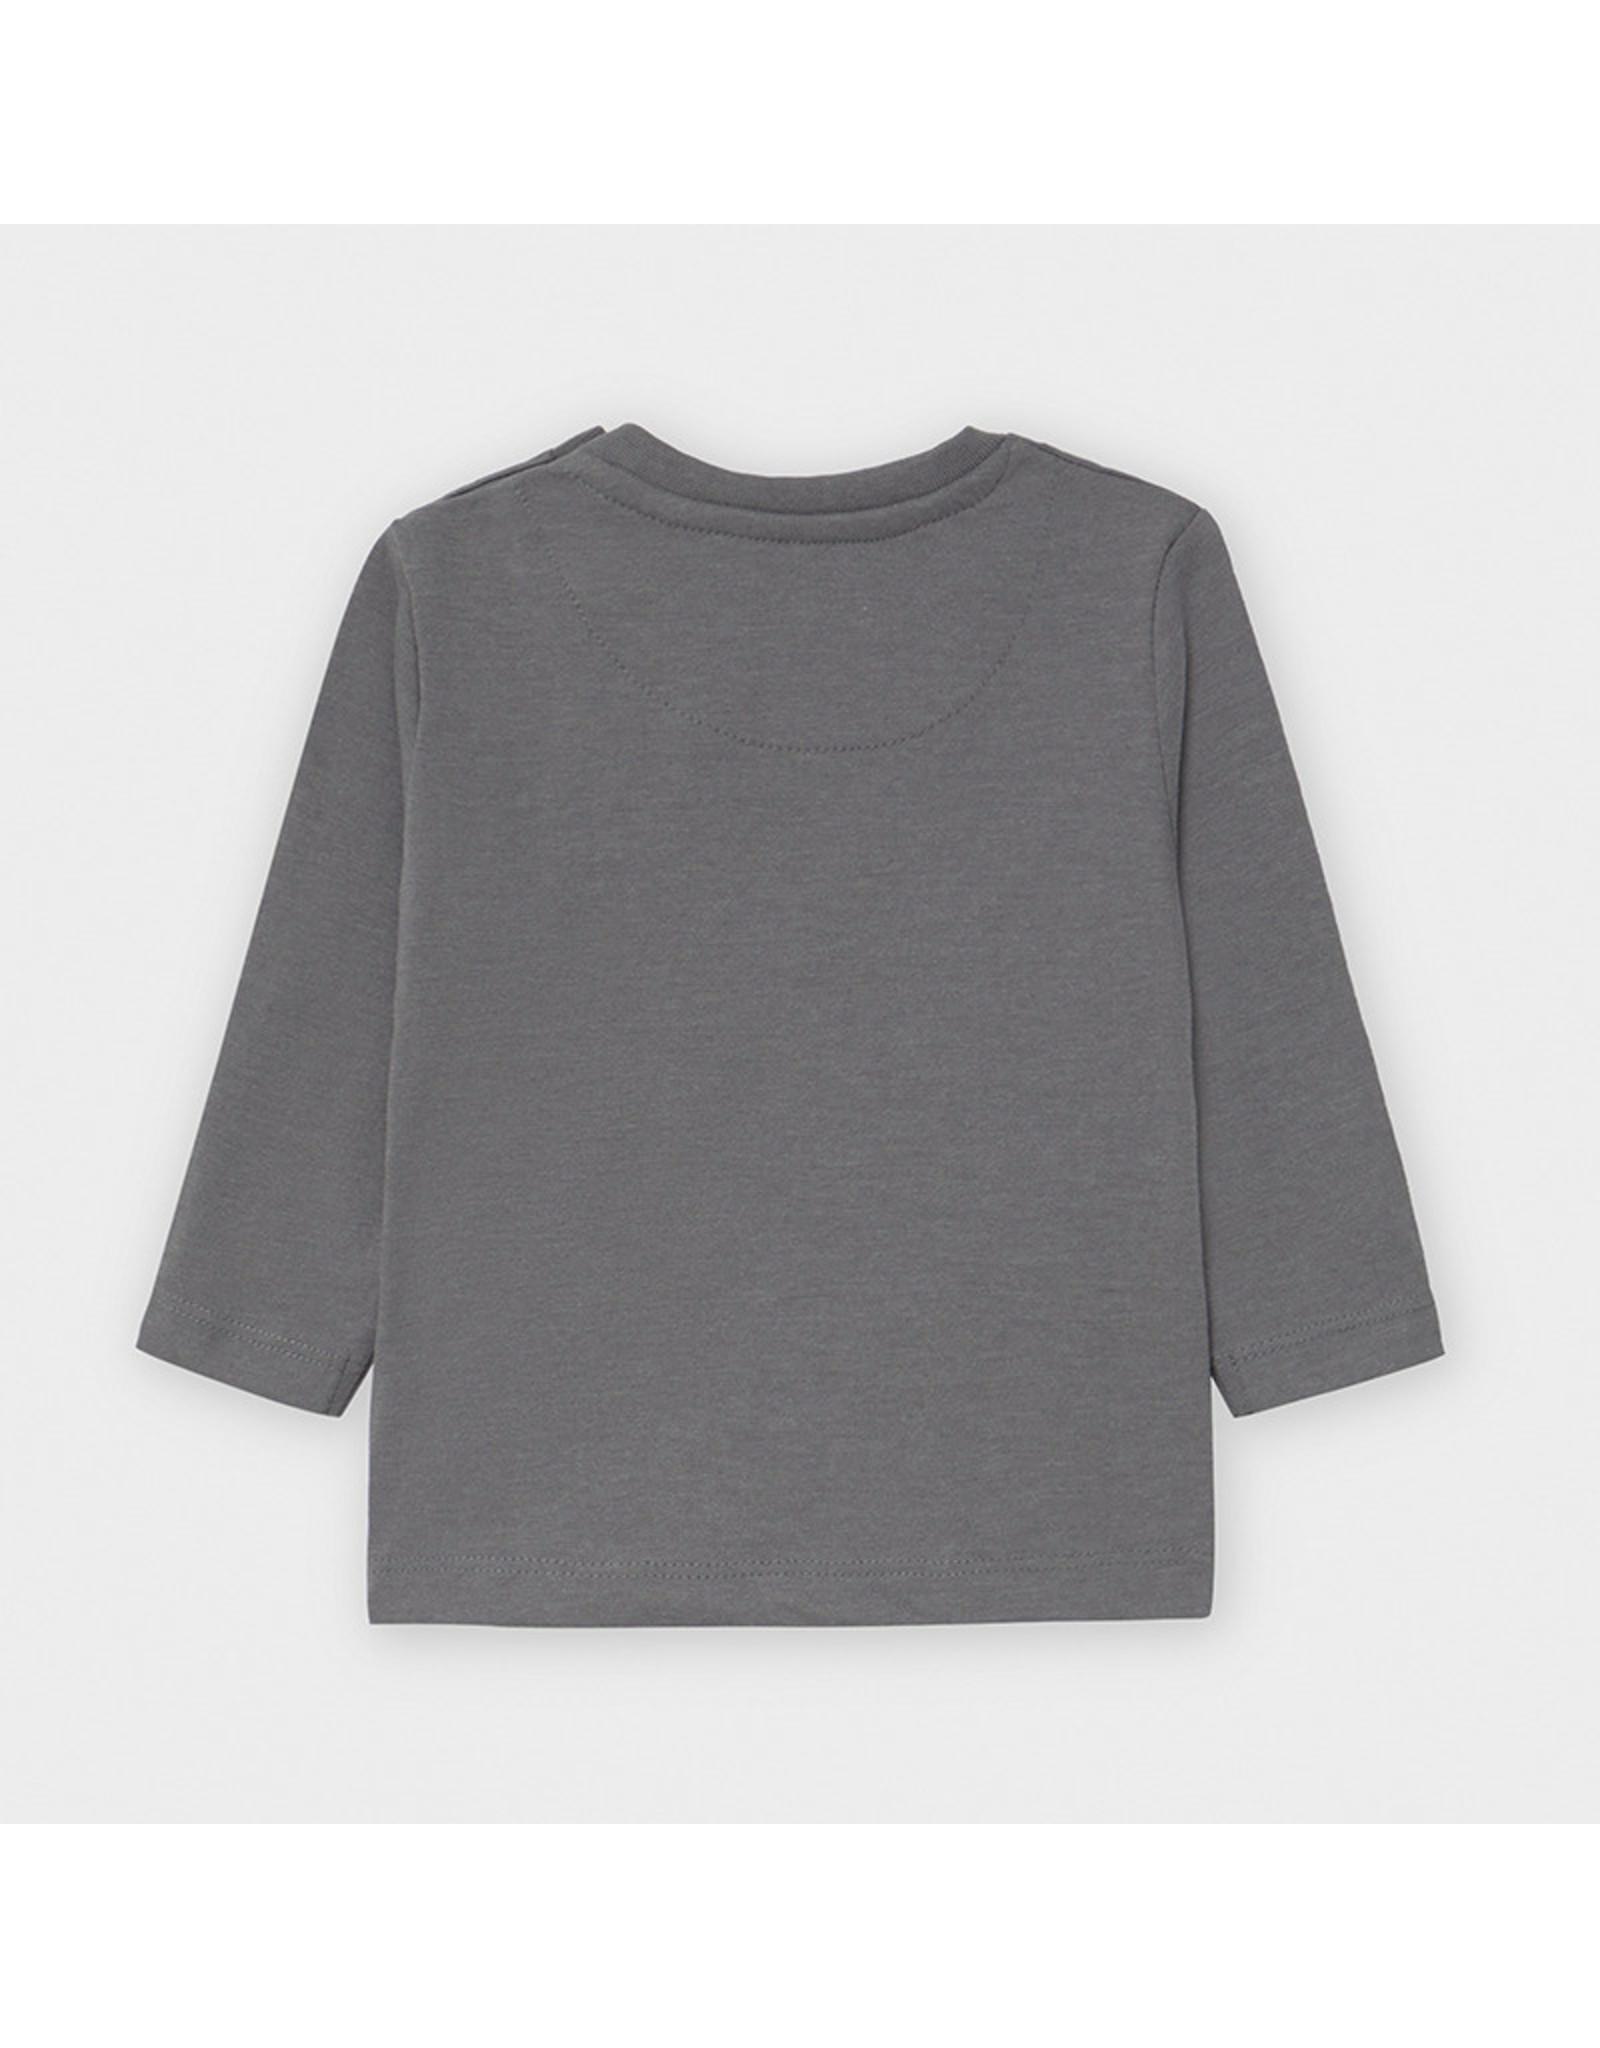 Mayoral L/s basic t-shirt Brg Cement